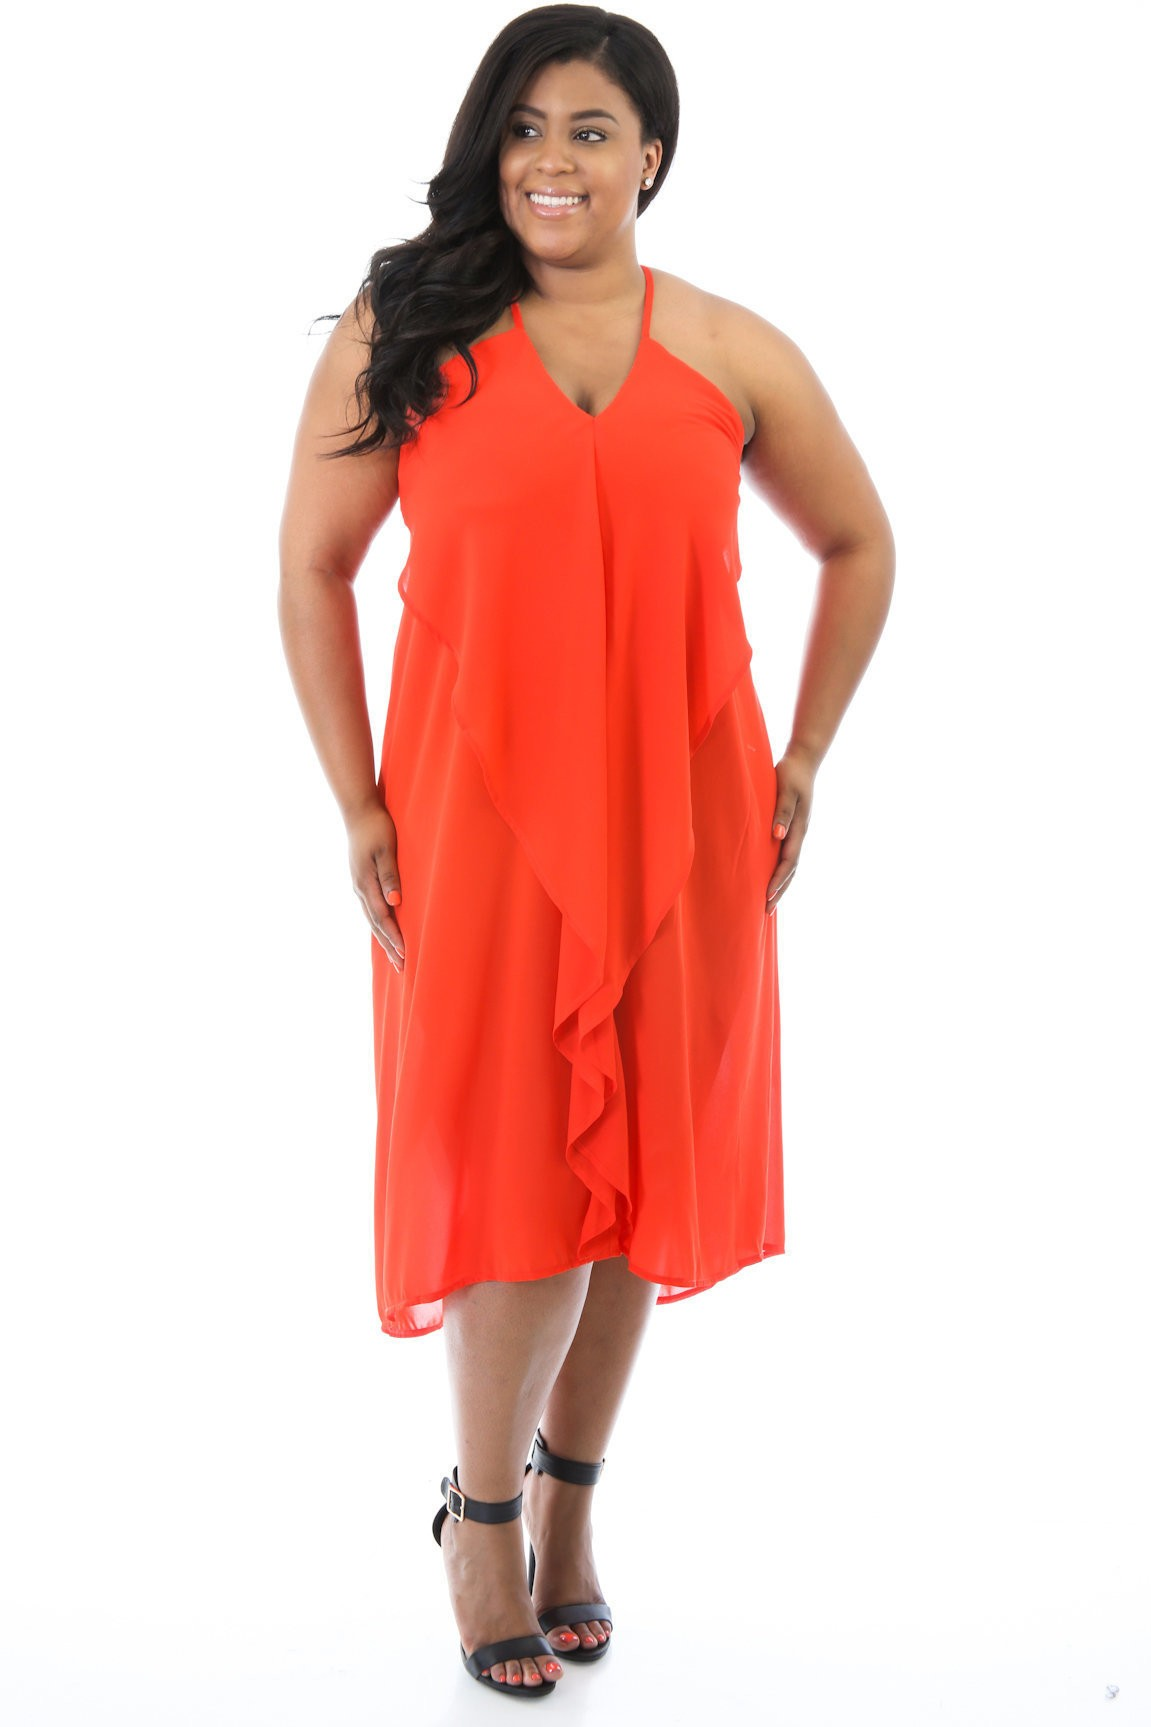 Hash Tag Beauty Dress